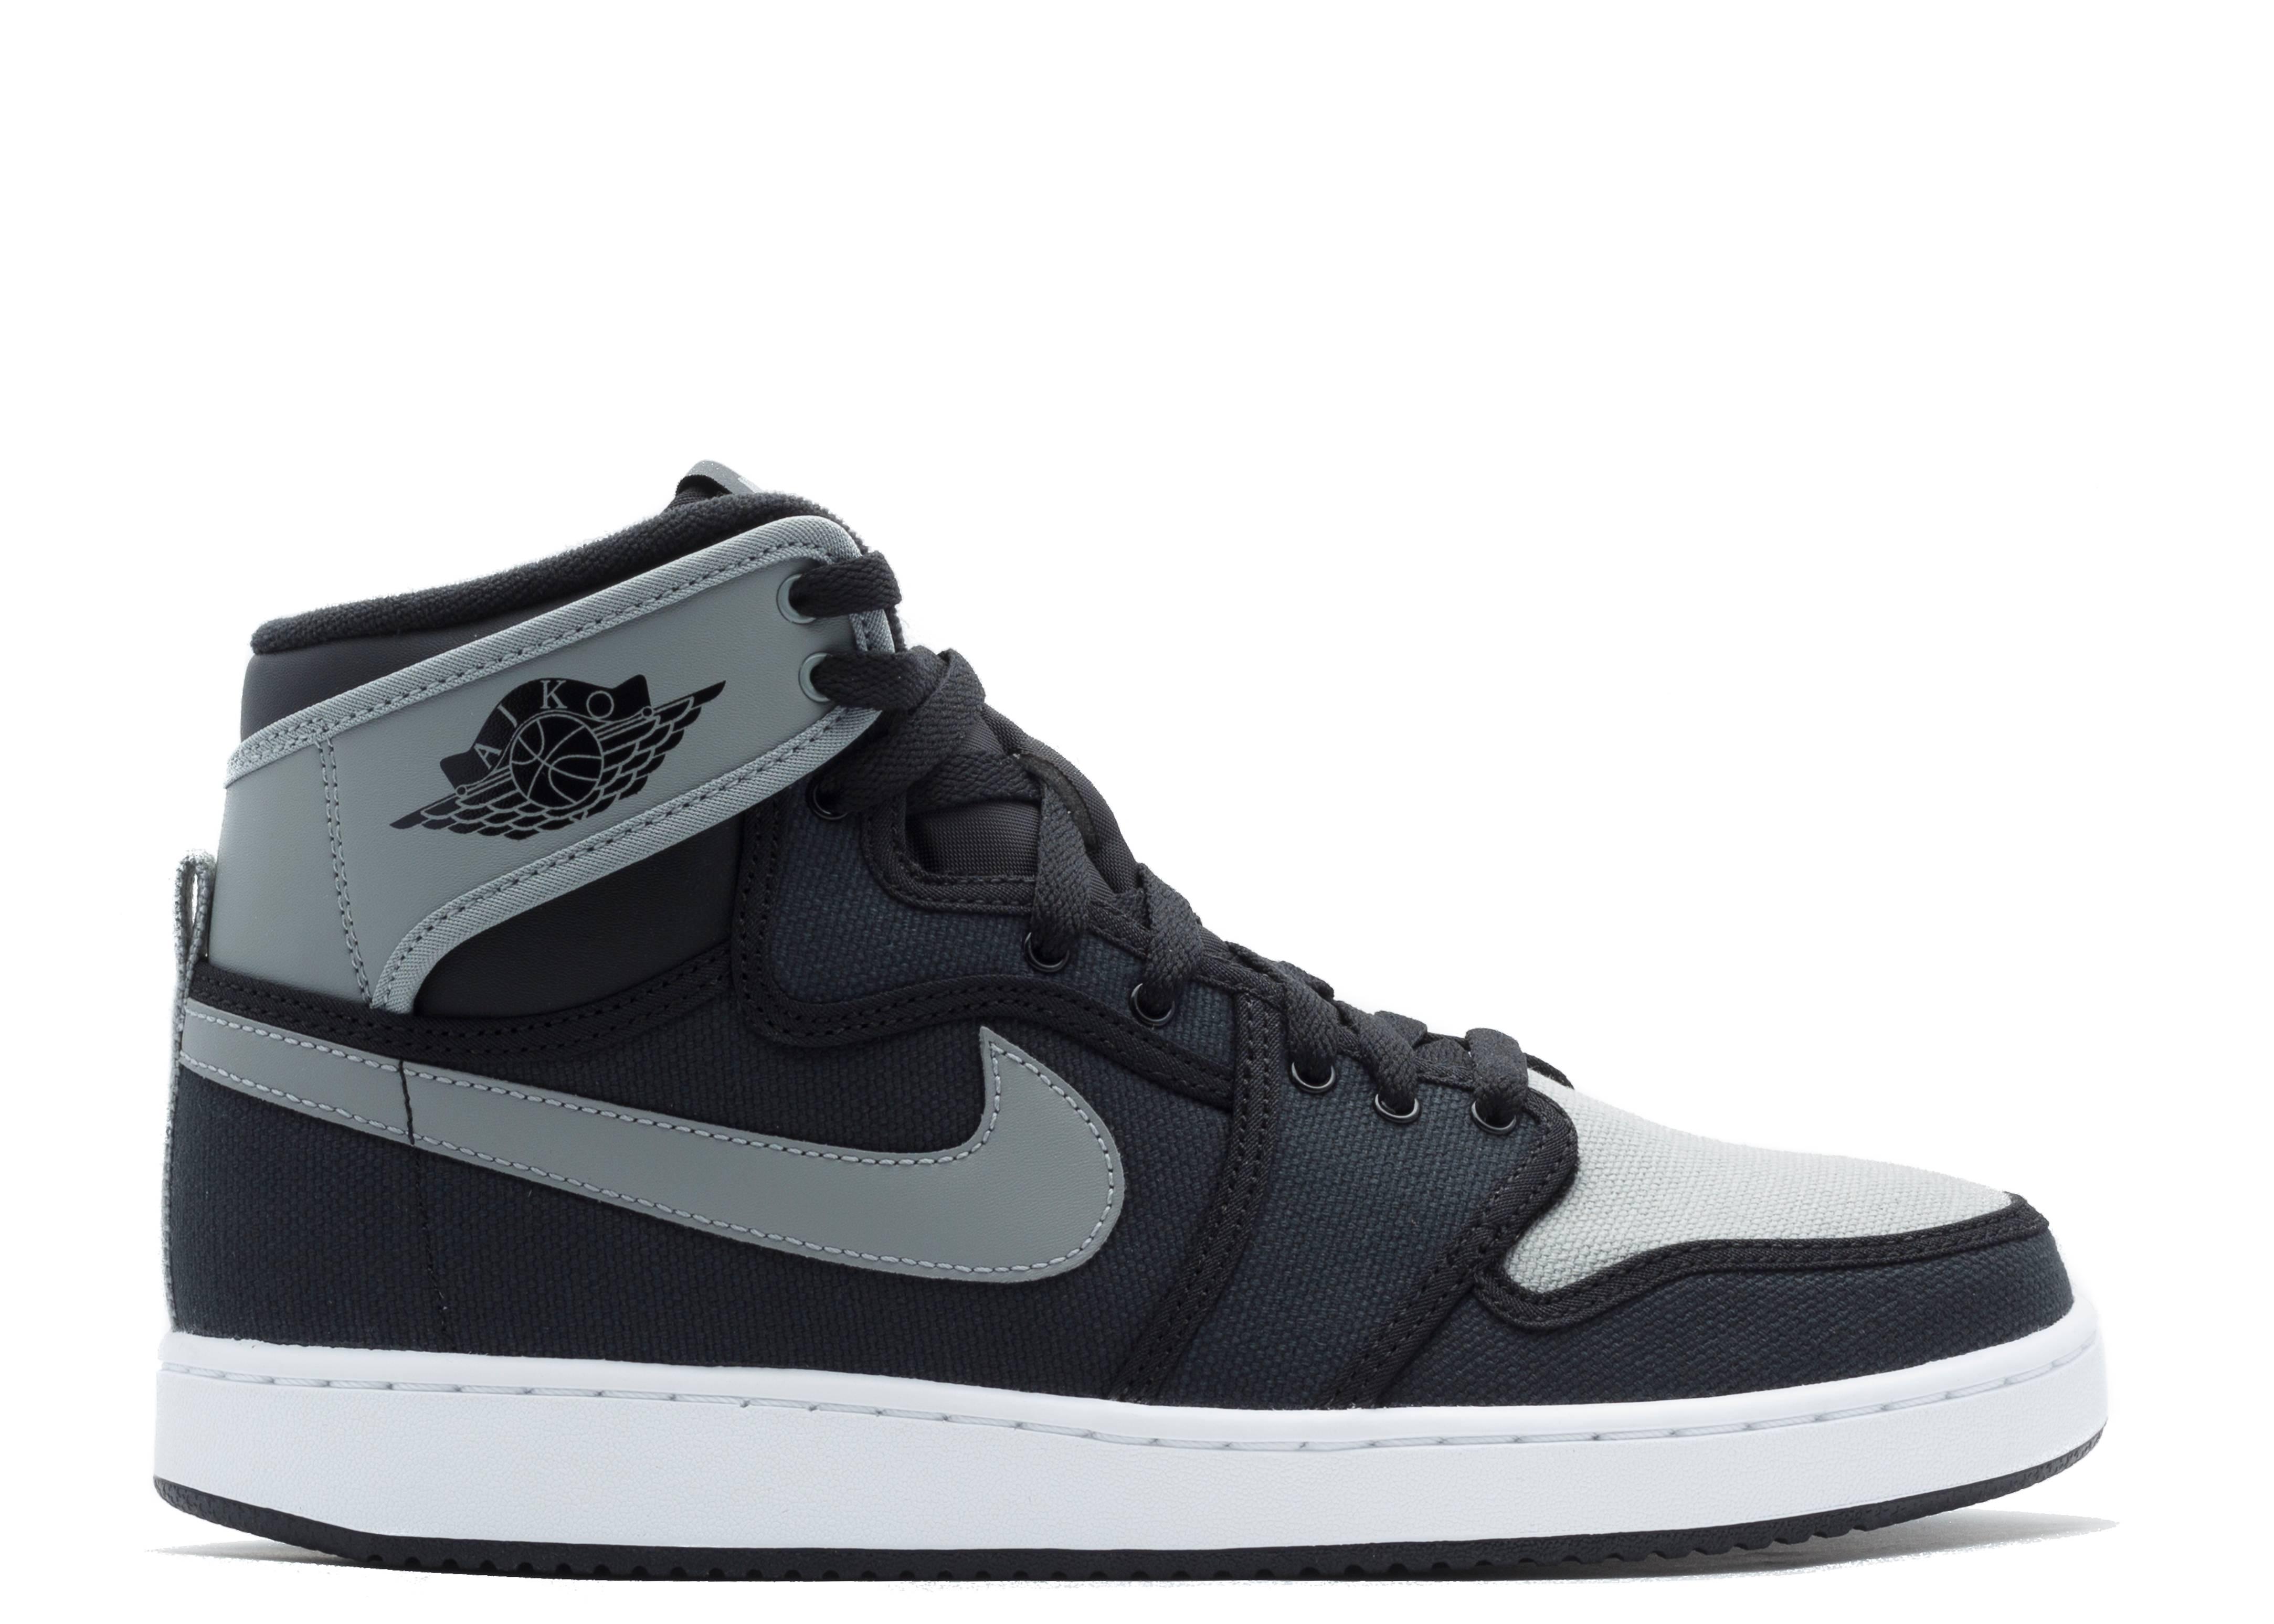 Grey Air Jordan Basketball Shoes